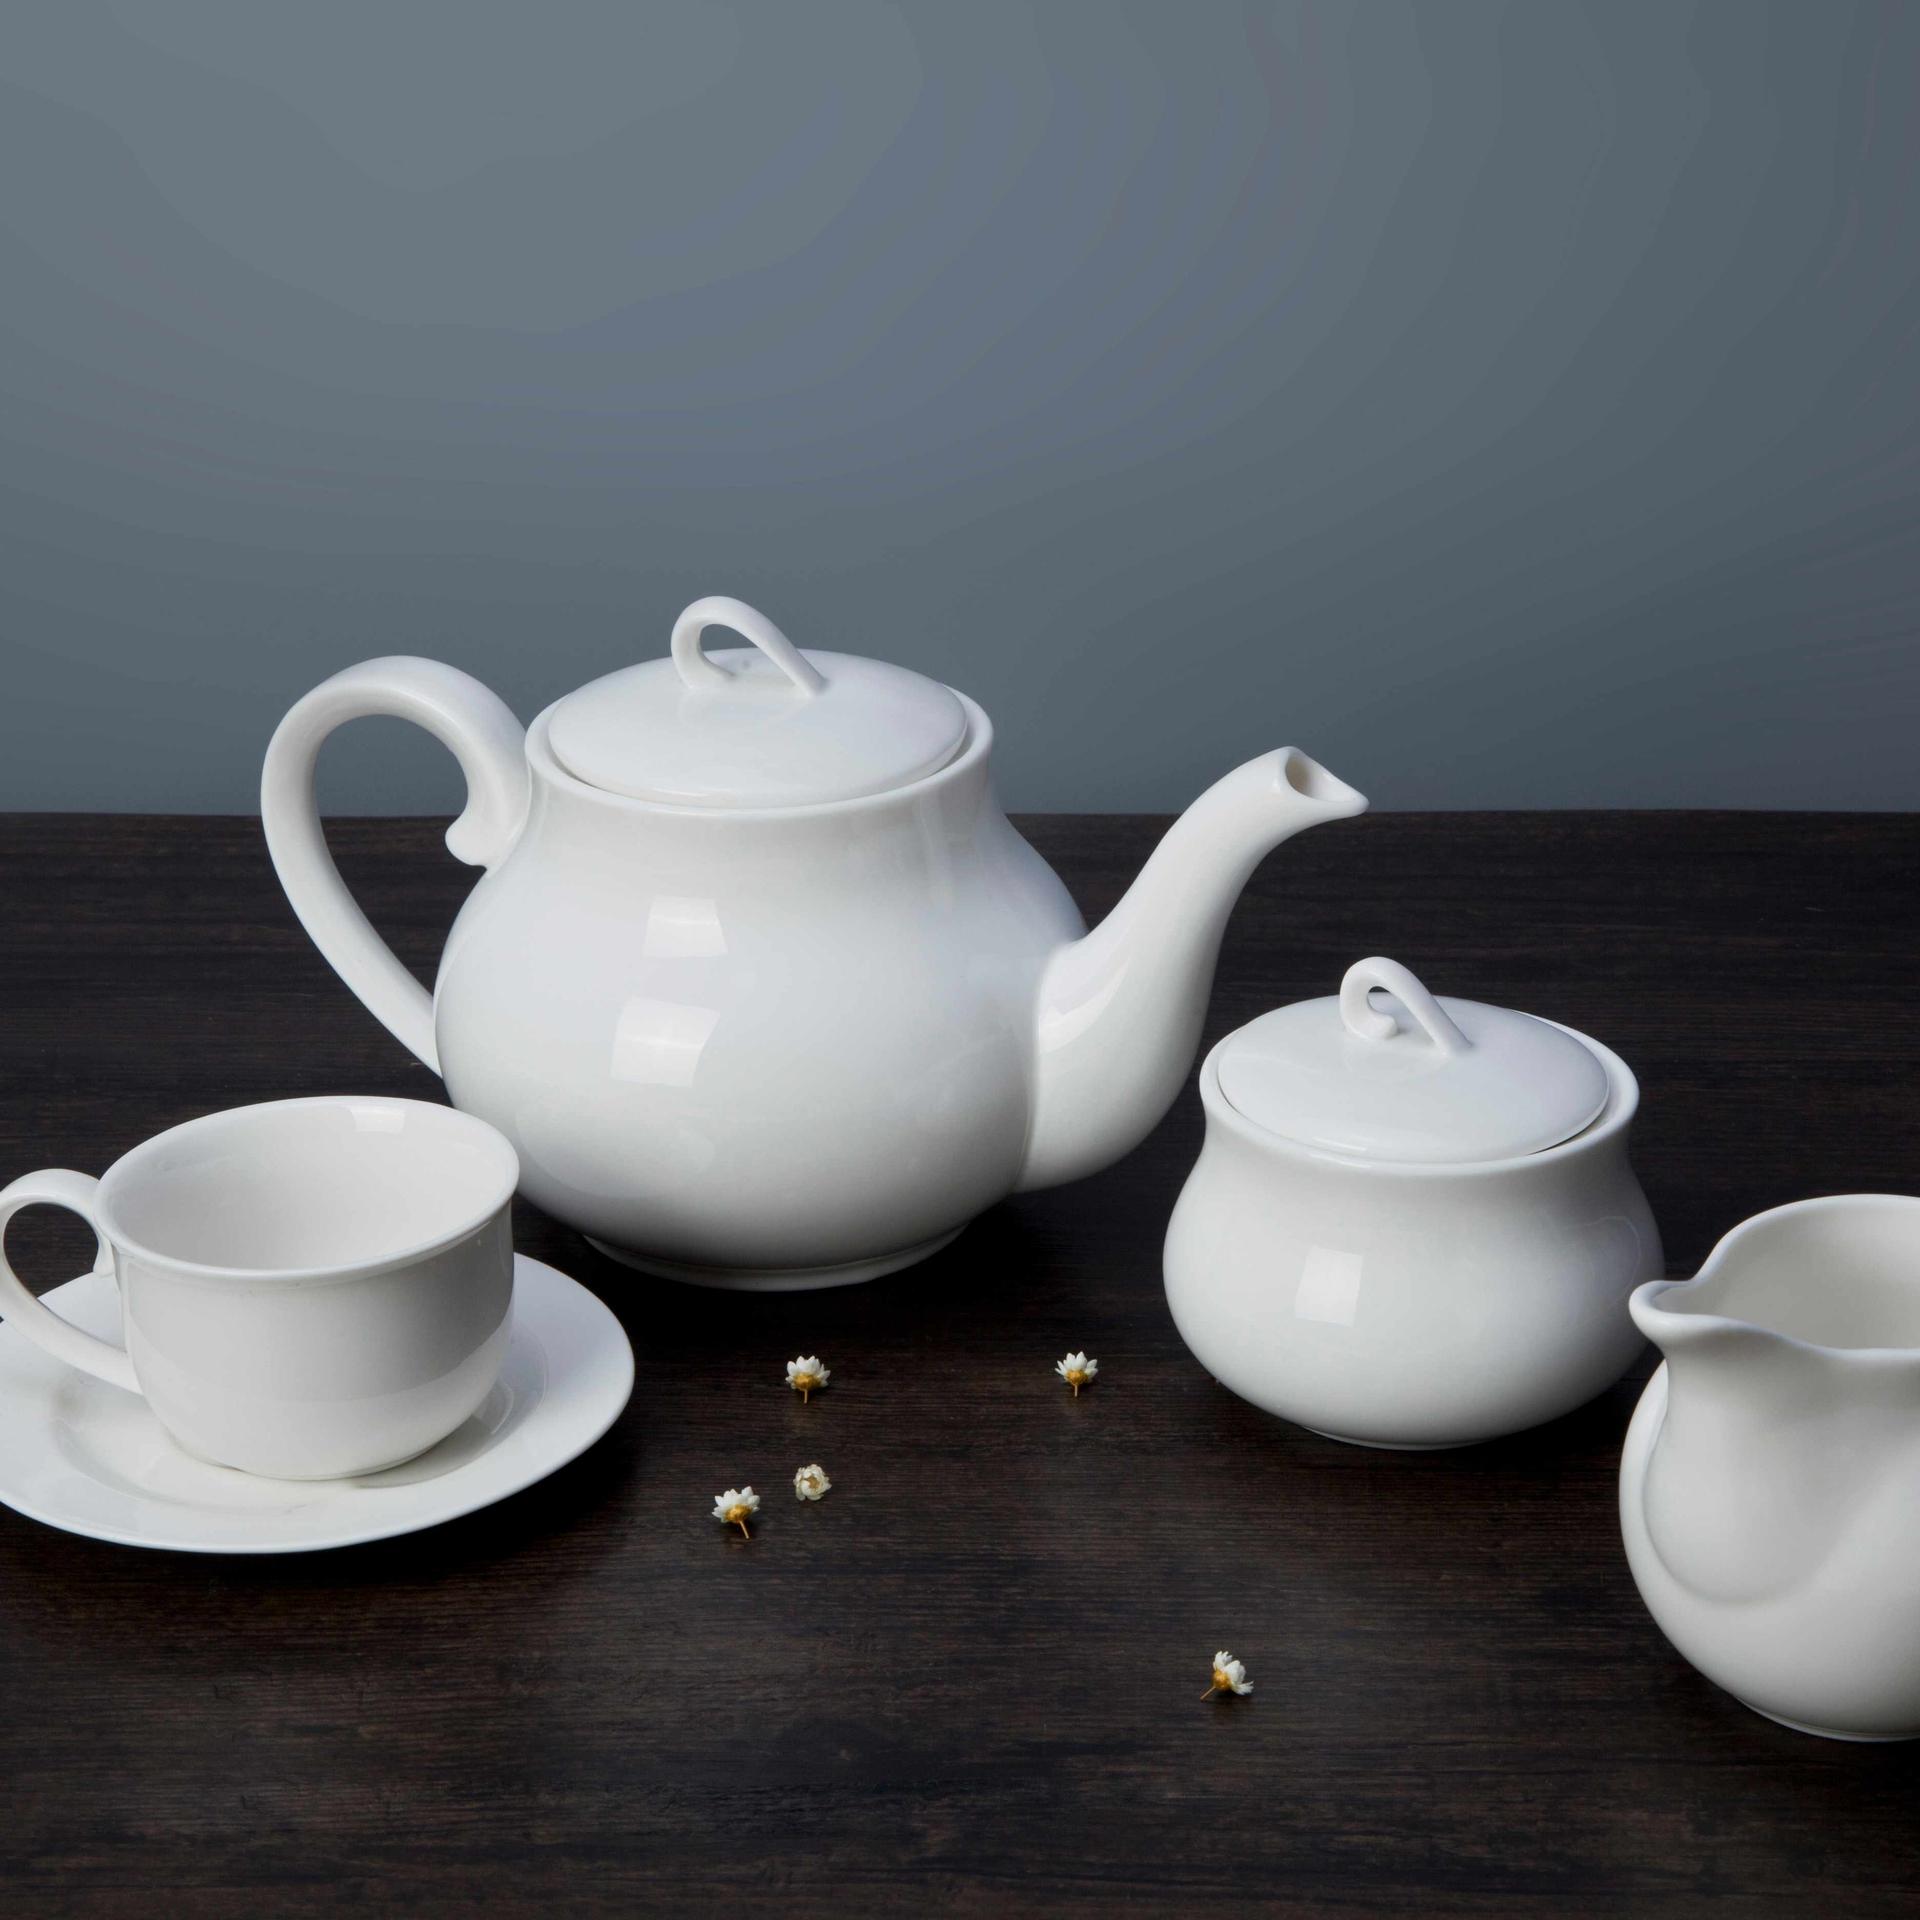 10 piece restaurant white ceramic dinnerware set - TW22